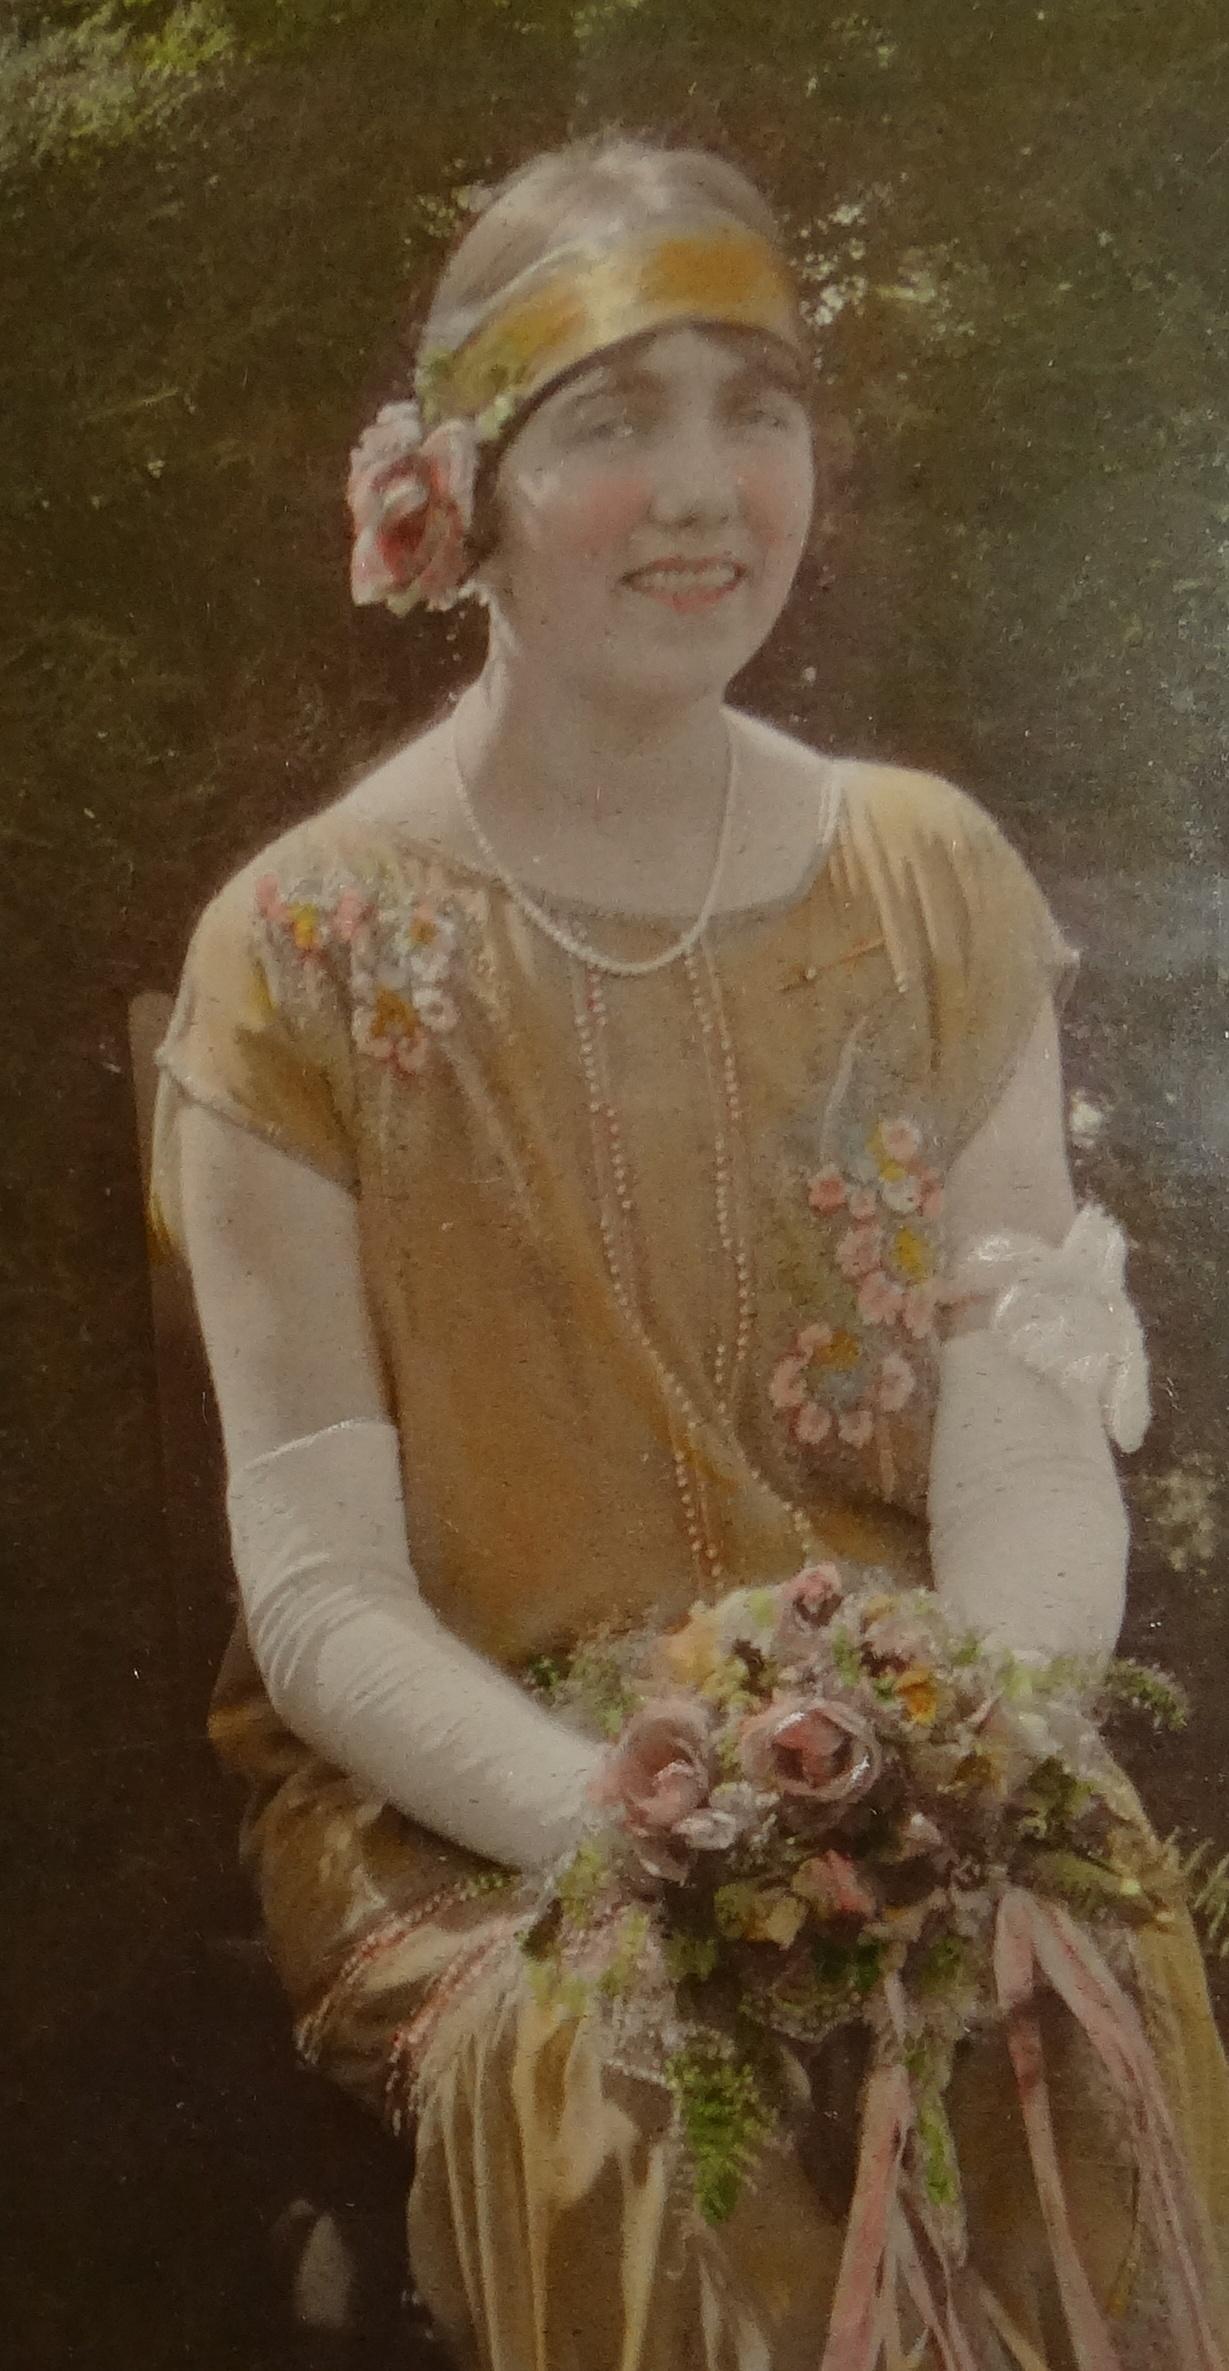 Carrie 1920